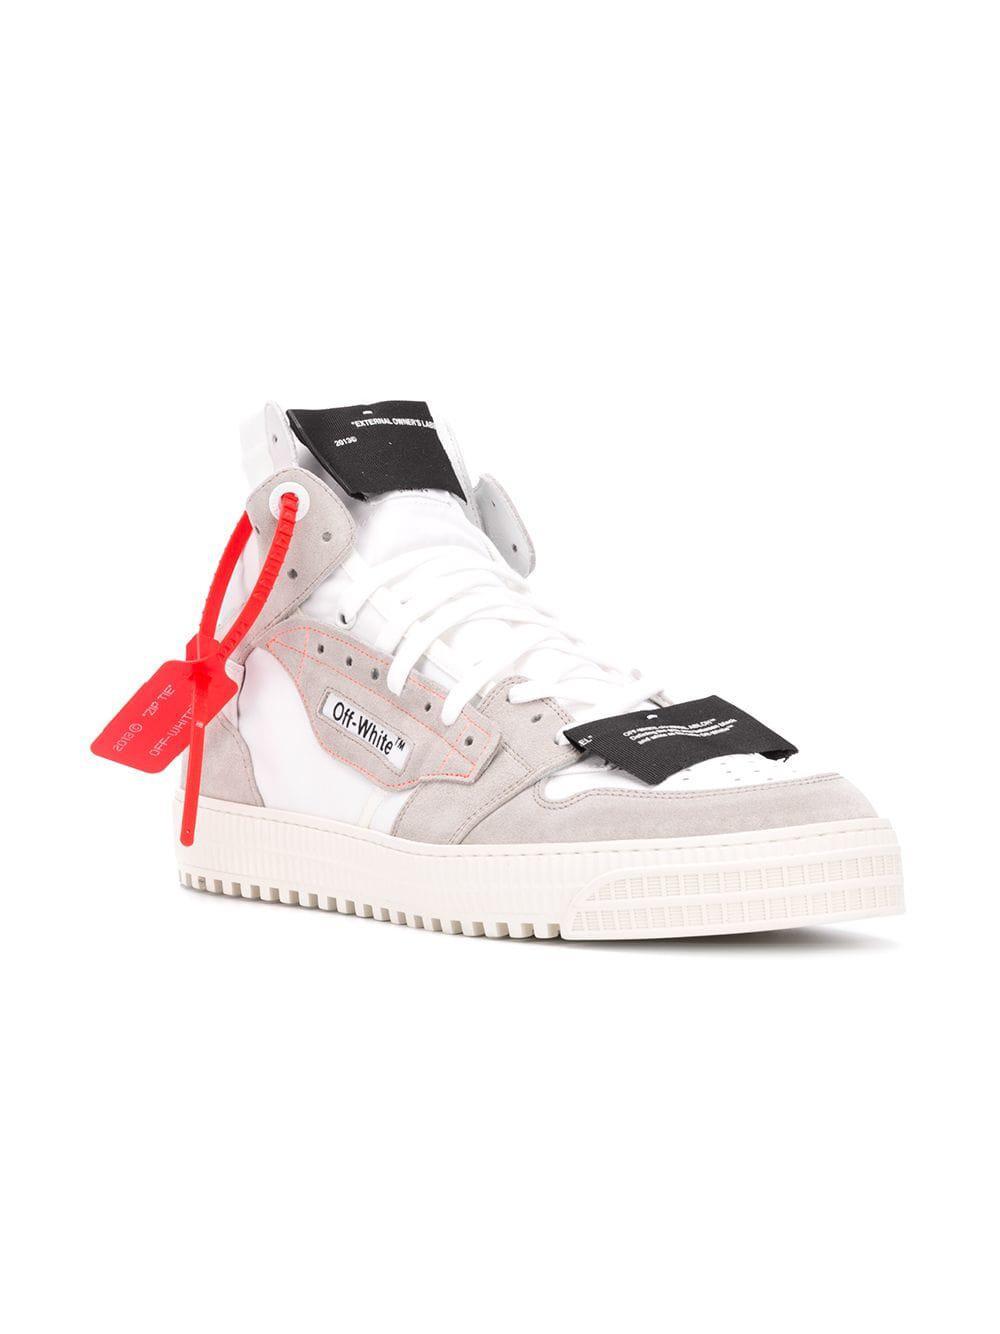 8db1d23da4323e Off-White c/o Virgil Abloh Off-court 3.0 Hi-top Sneakers in White for Men -  Save 5% - Lyst